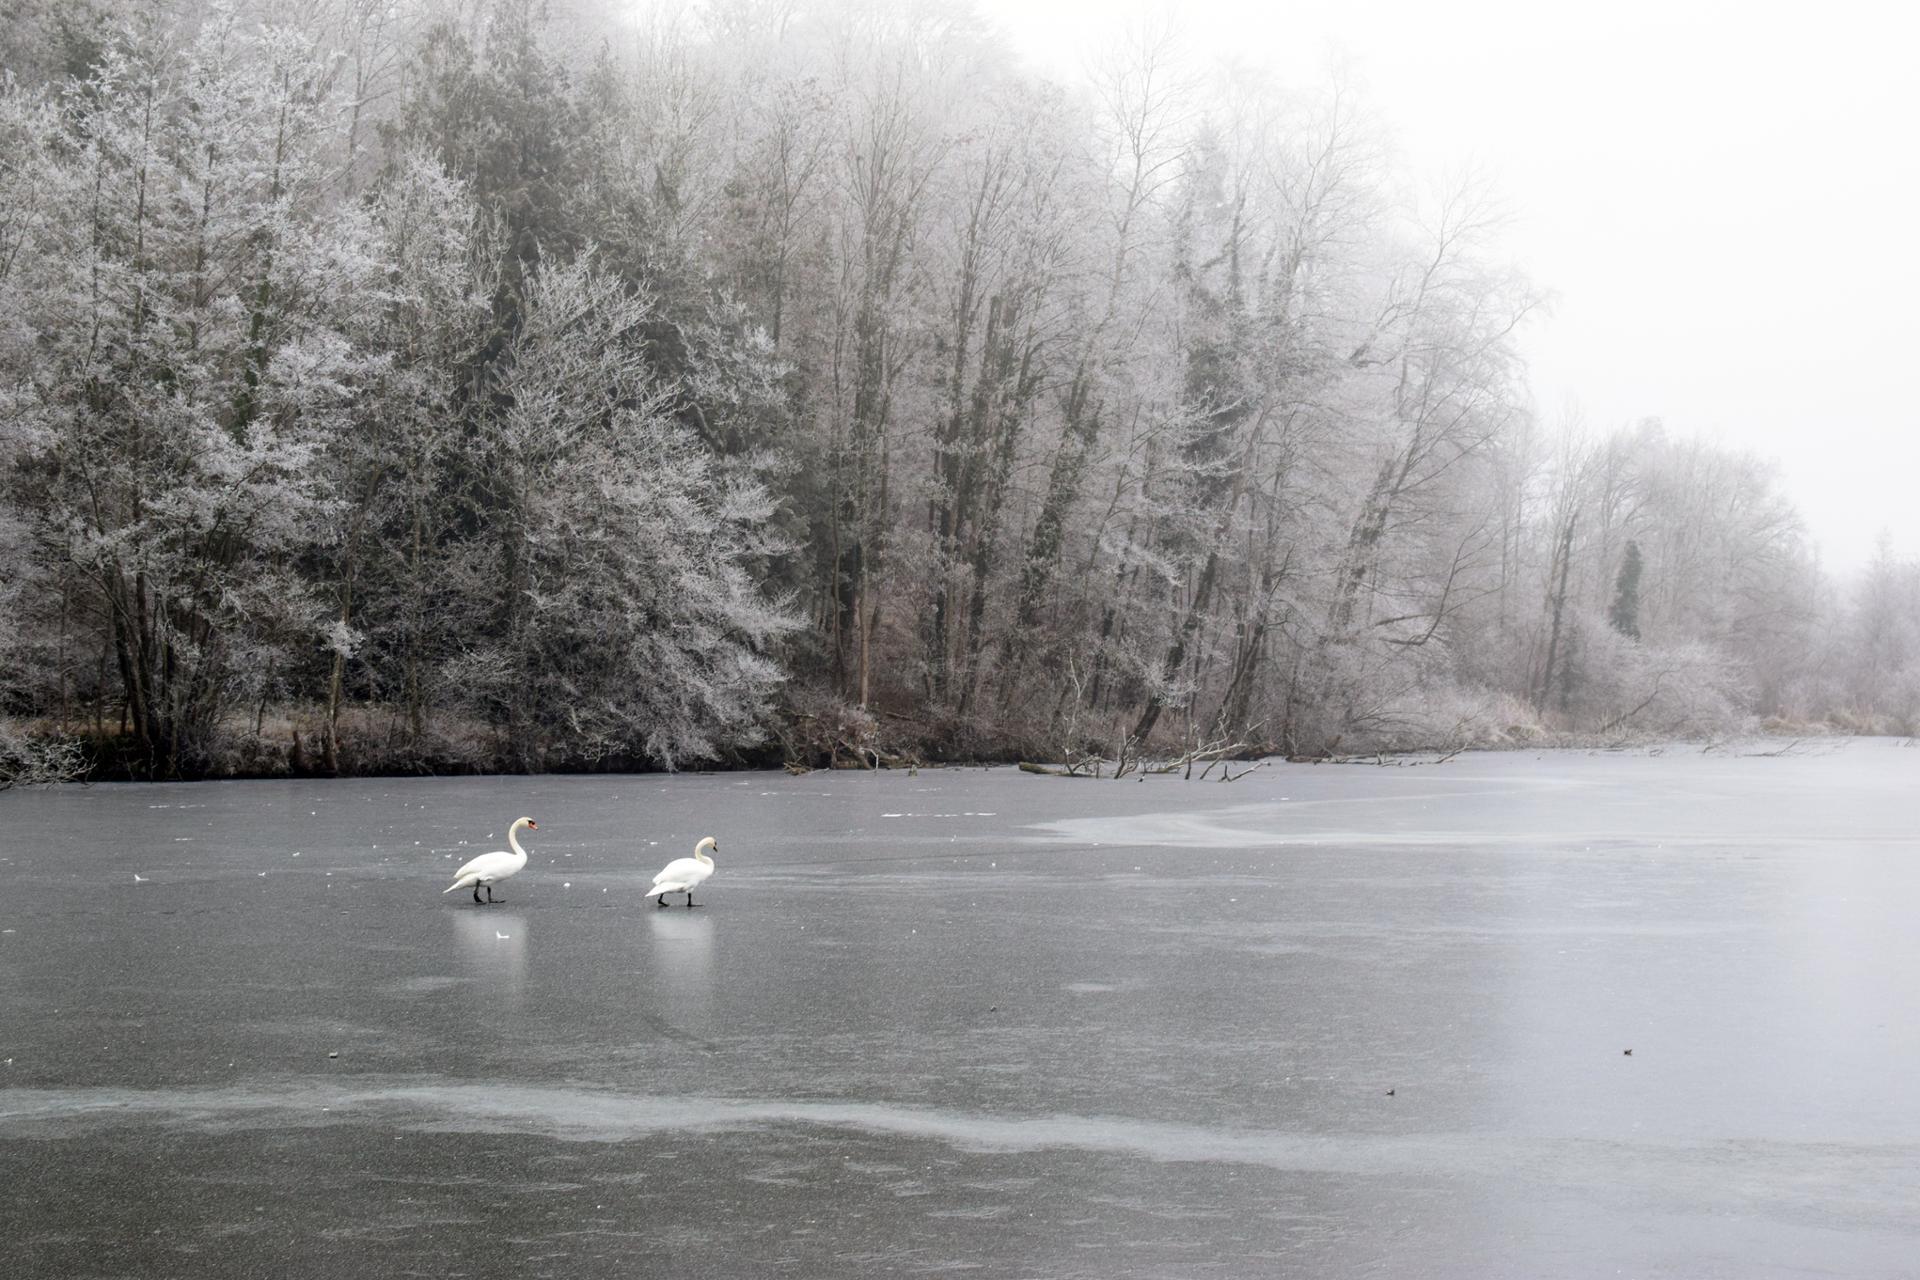 balade sur la glace